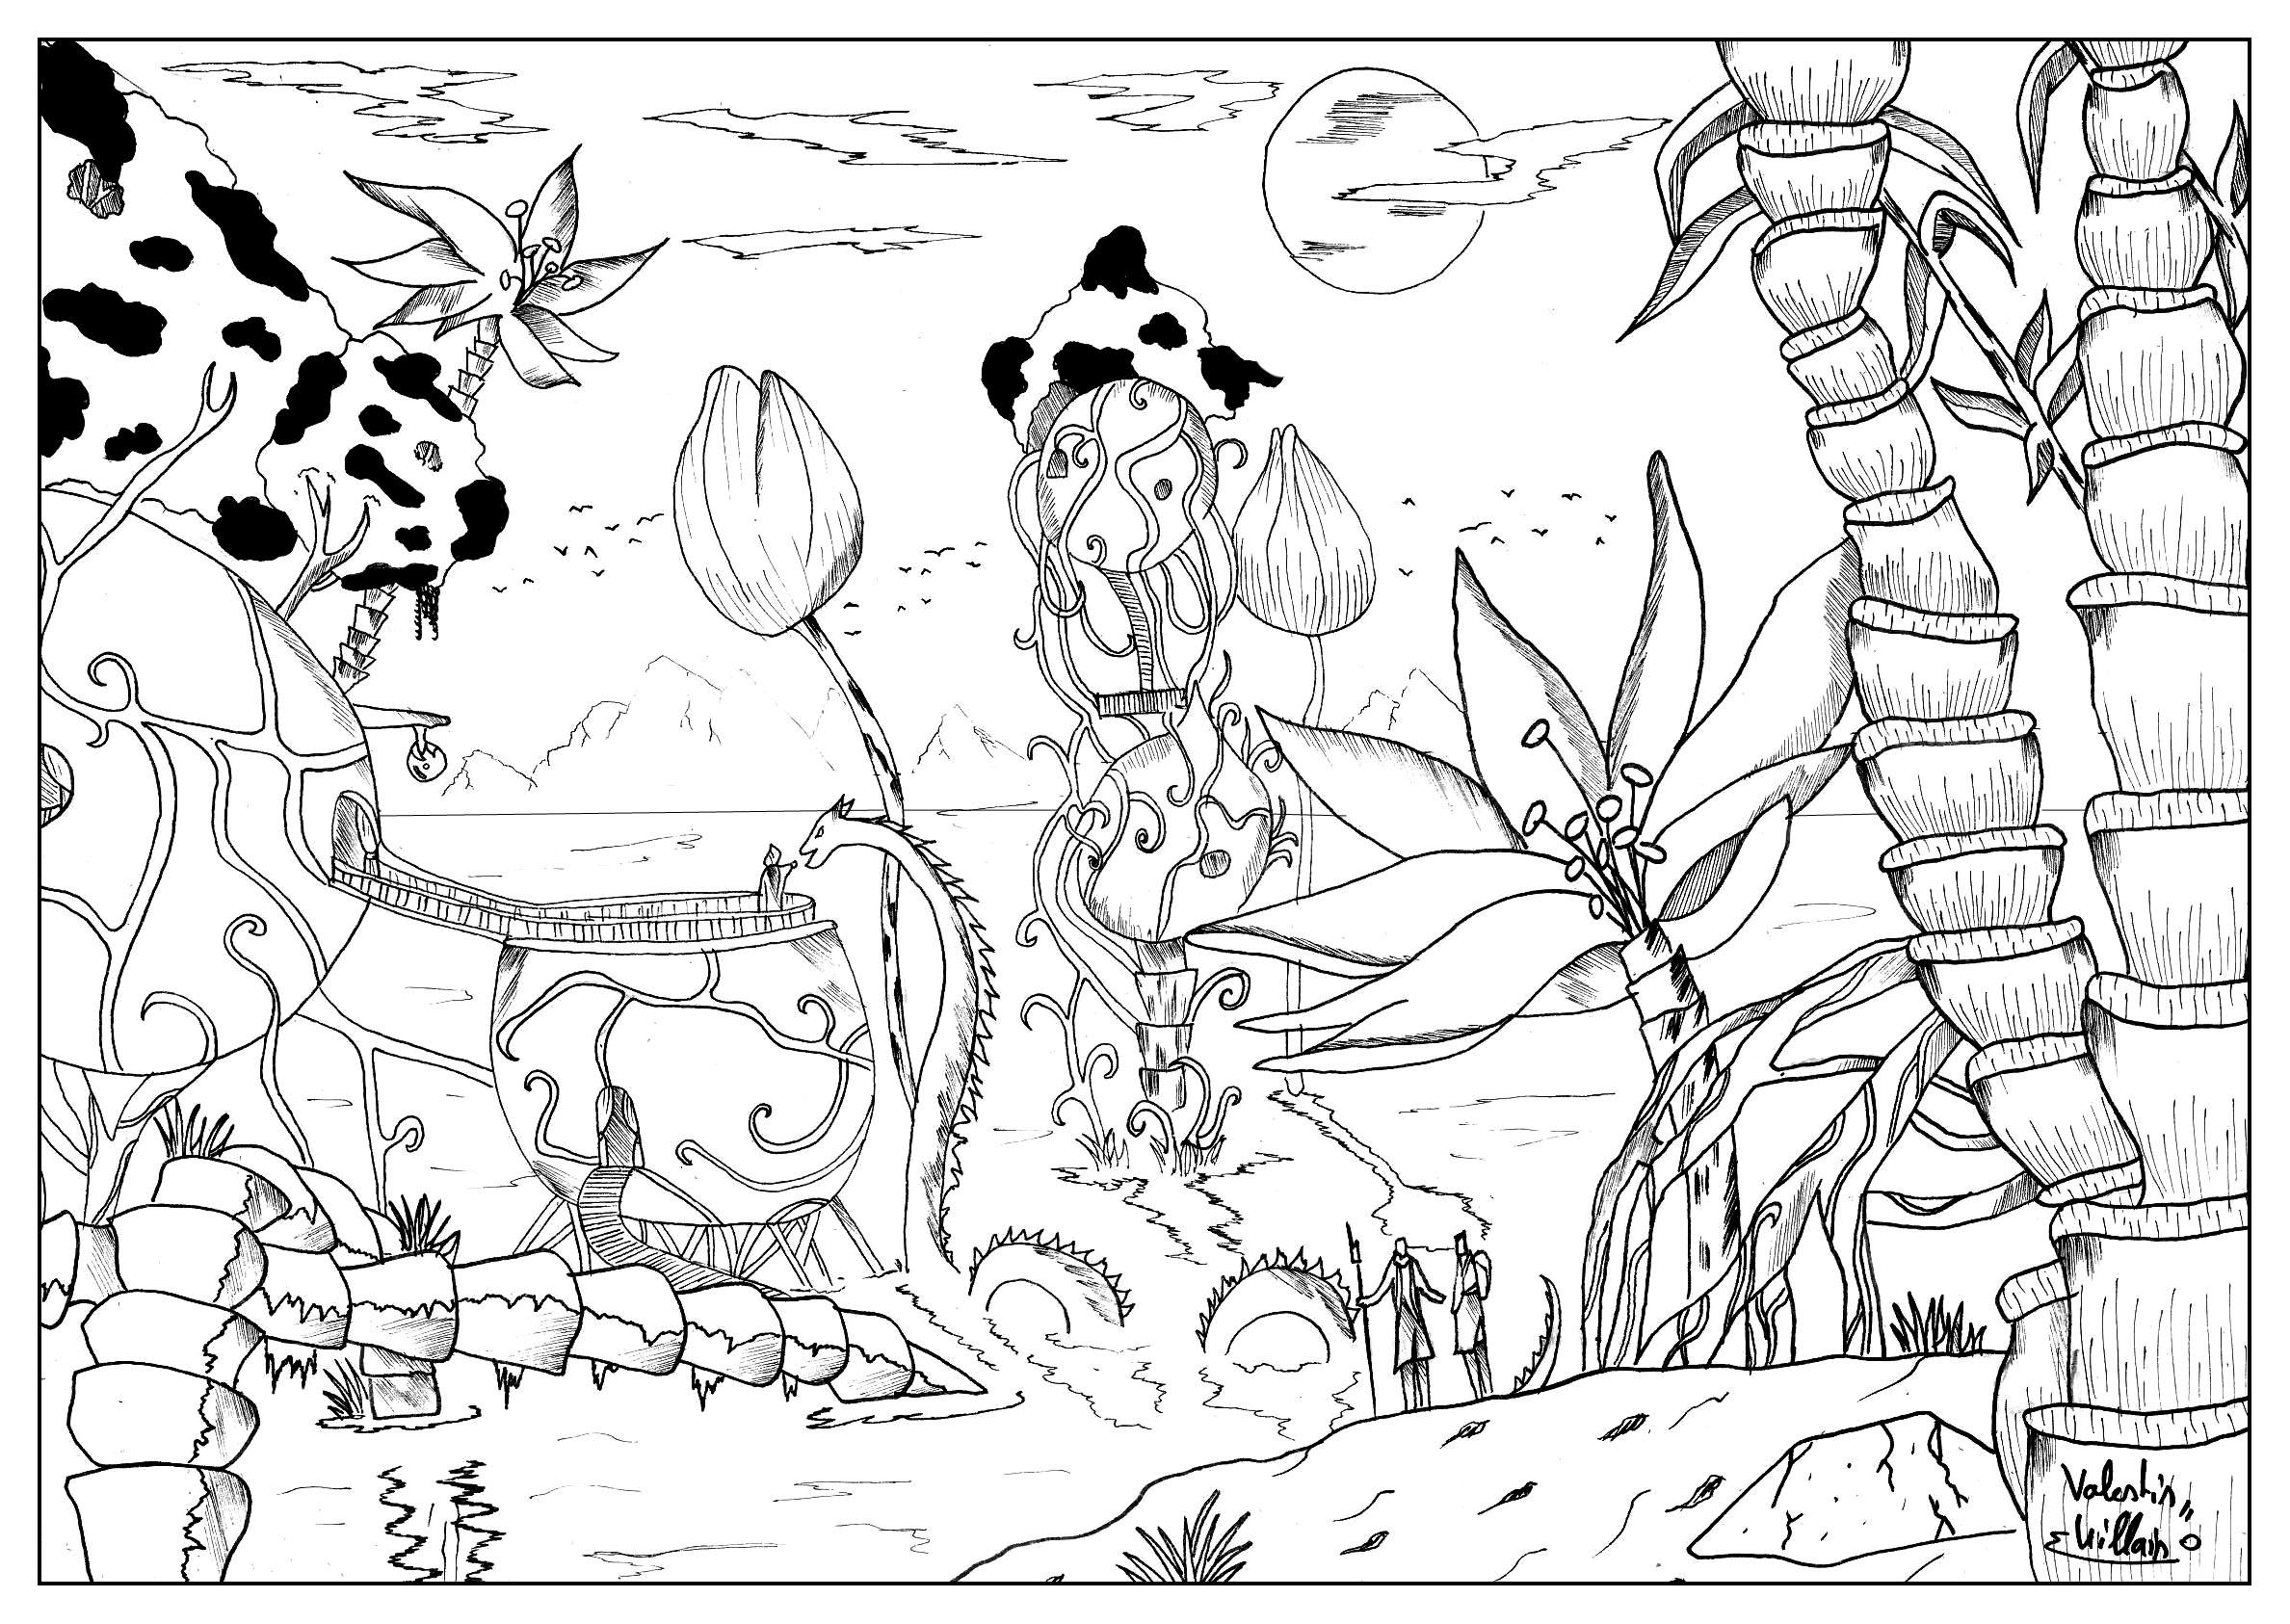 Coloriage adulte dessin paysage par valentin.jpg